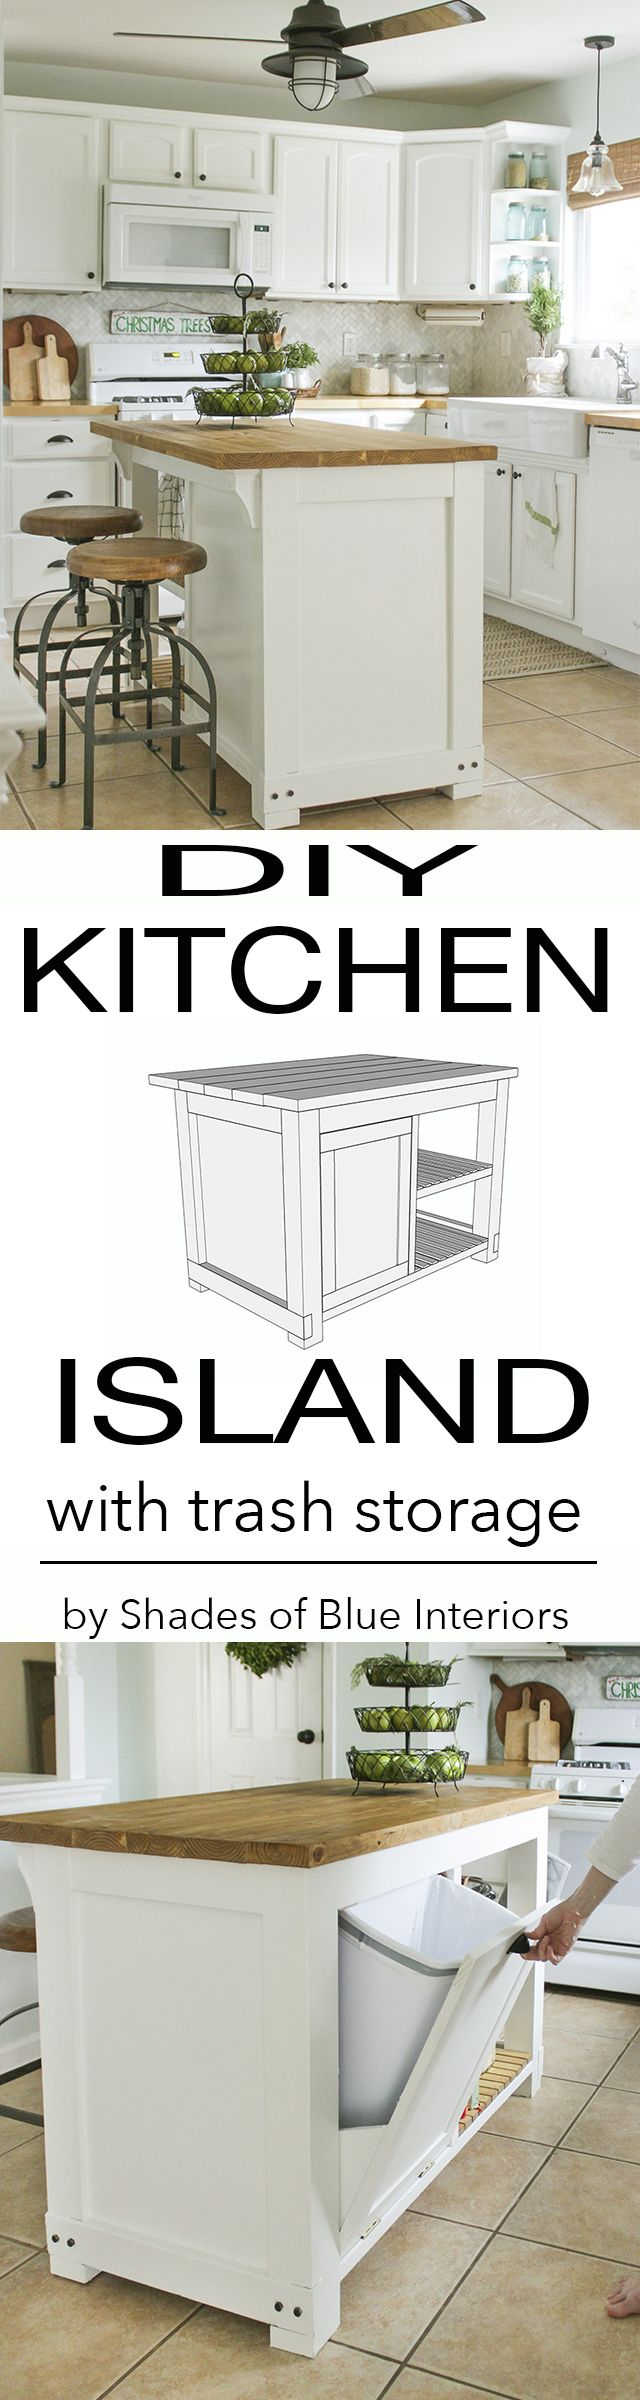 Diy Kitchen Island Diy Kitchen Island With Trash Storage And Free Downloadable Build